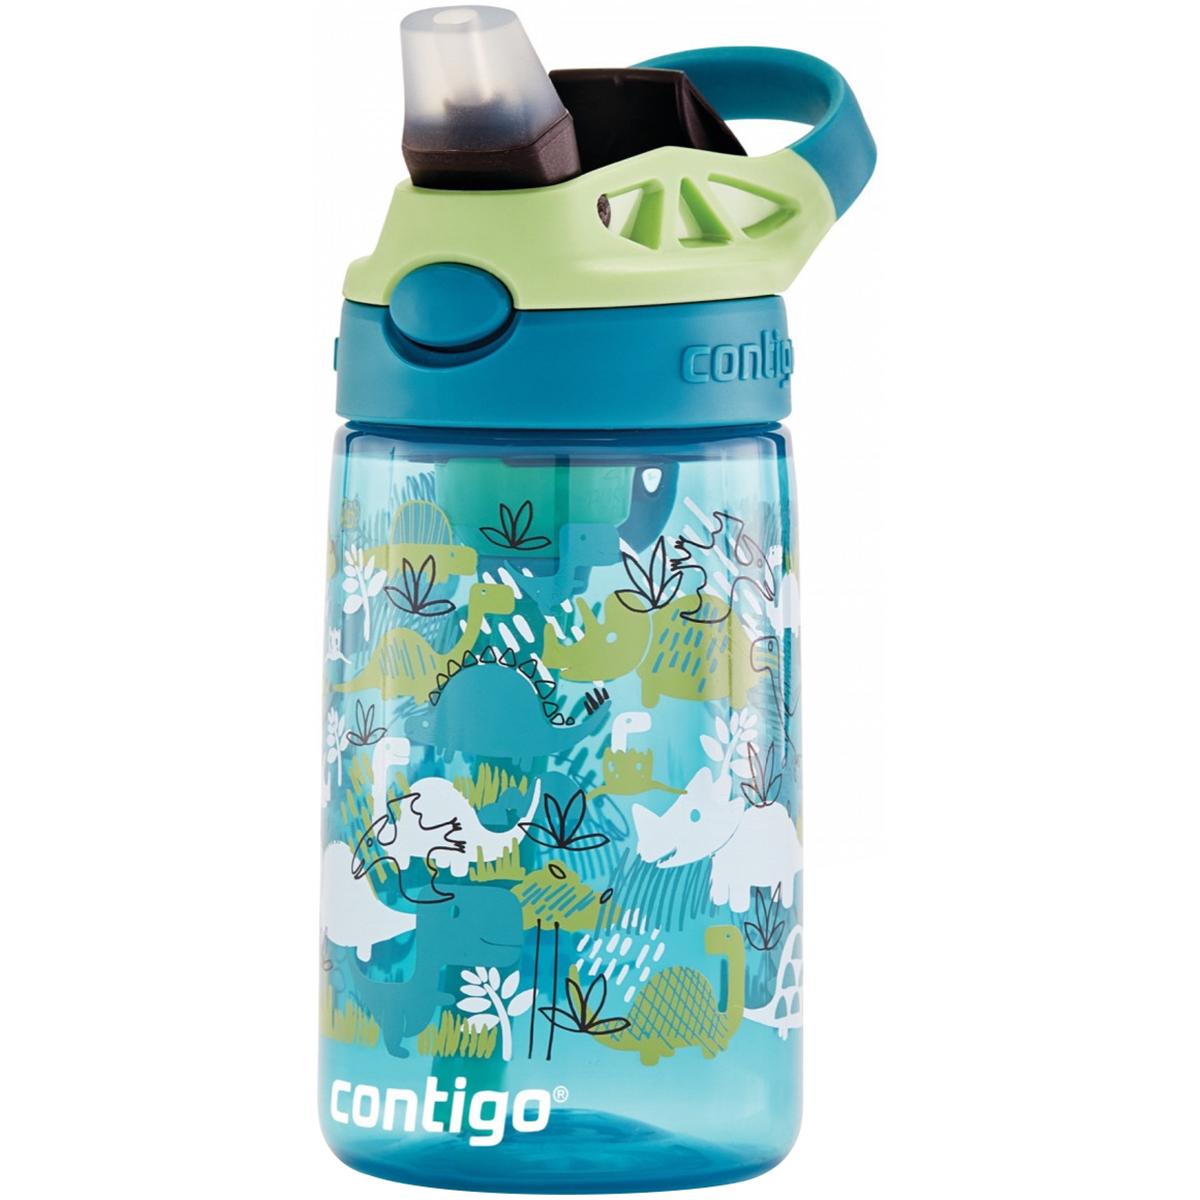 Contigo-Kid-039-s-14-oz-AutoSpout-Straw-Water-Bottle-with-Easy-Clean-Lid thumbnail 10